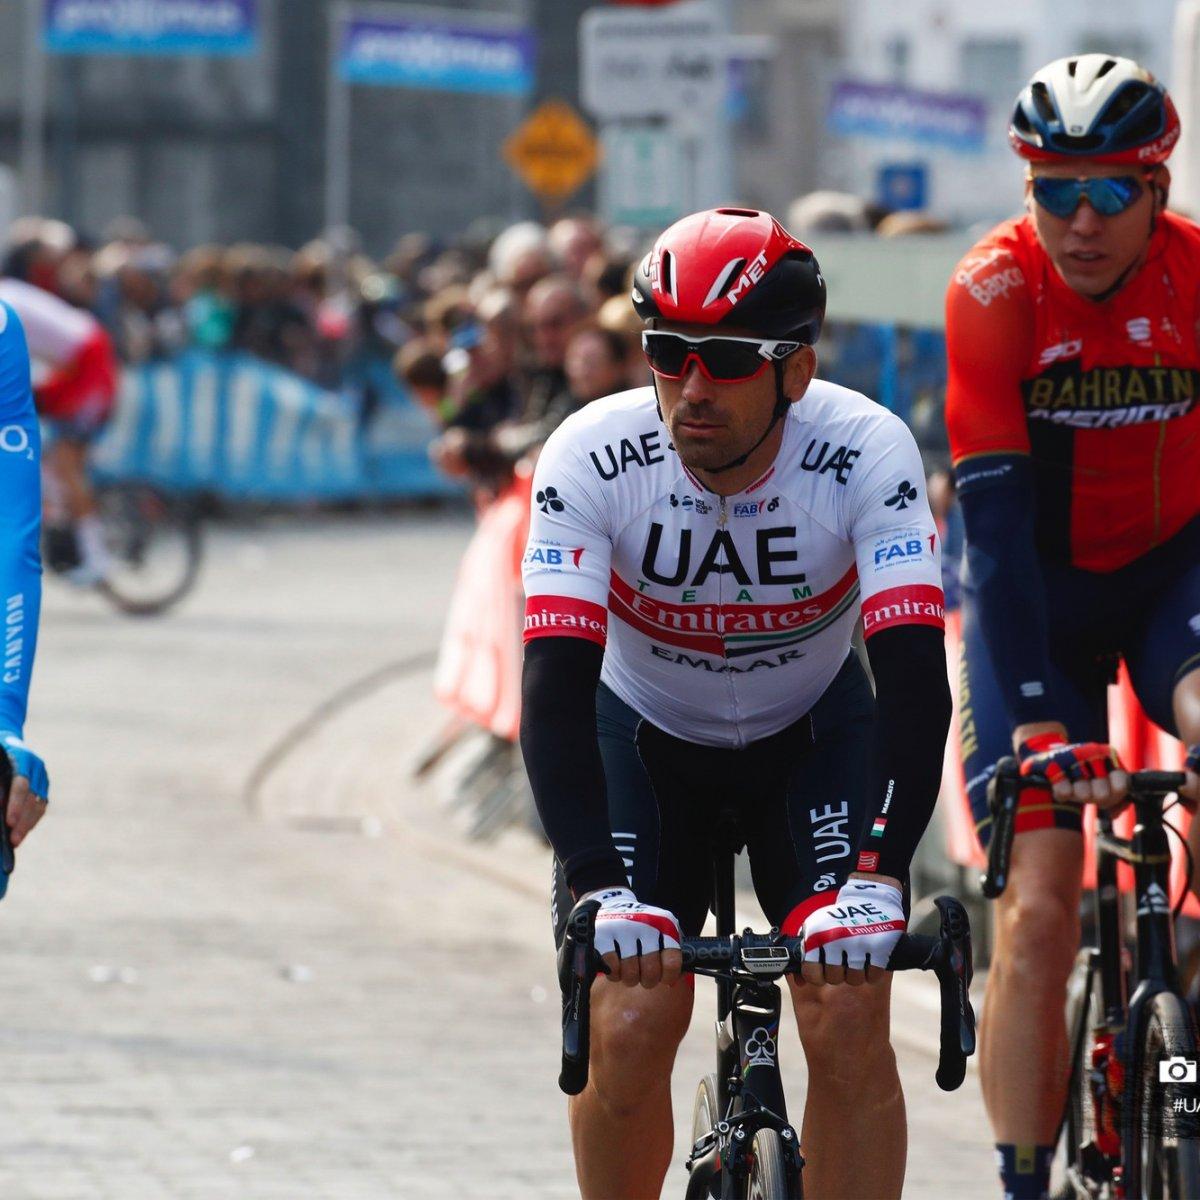 Gent Wevelgem 2019 - 81th Edition - Deinze - Wevelgem 251 km - 31/03/2019 - Marco Marcato (ITA - UAE - Team Emirates) - photo Luca Bettini/BettiniPhoto©2019